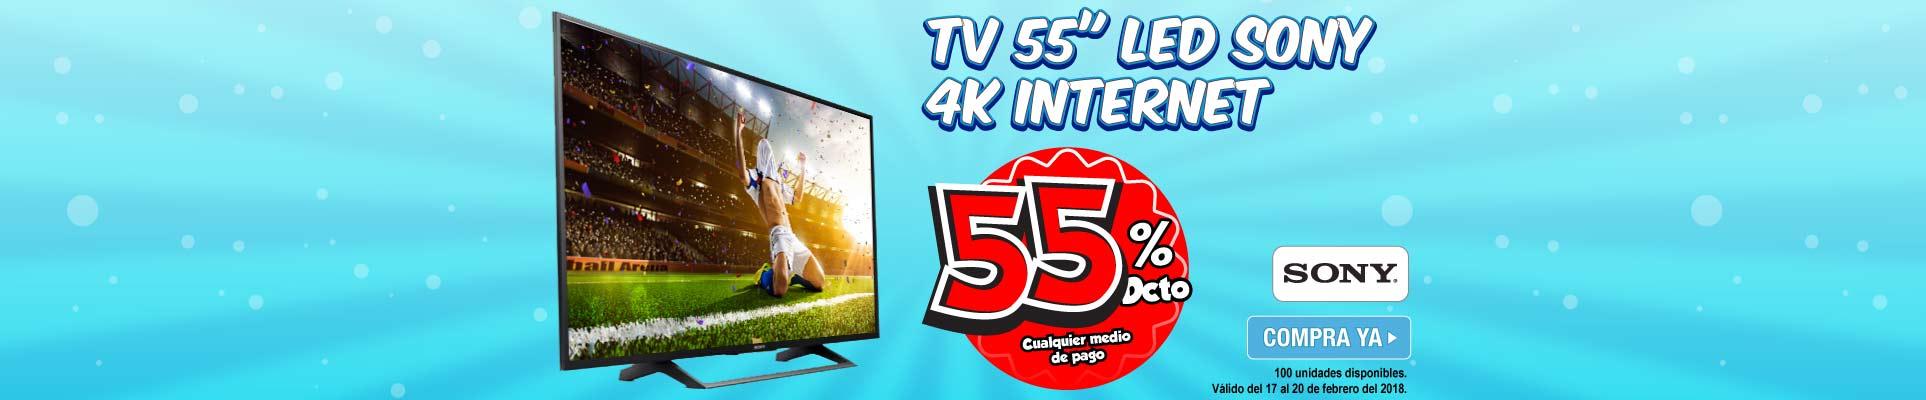 PPAL ALKP-5-TV-TV 55 138.8cm LED SONY 55X727E 4K Internet-prod-Febrero17-20